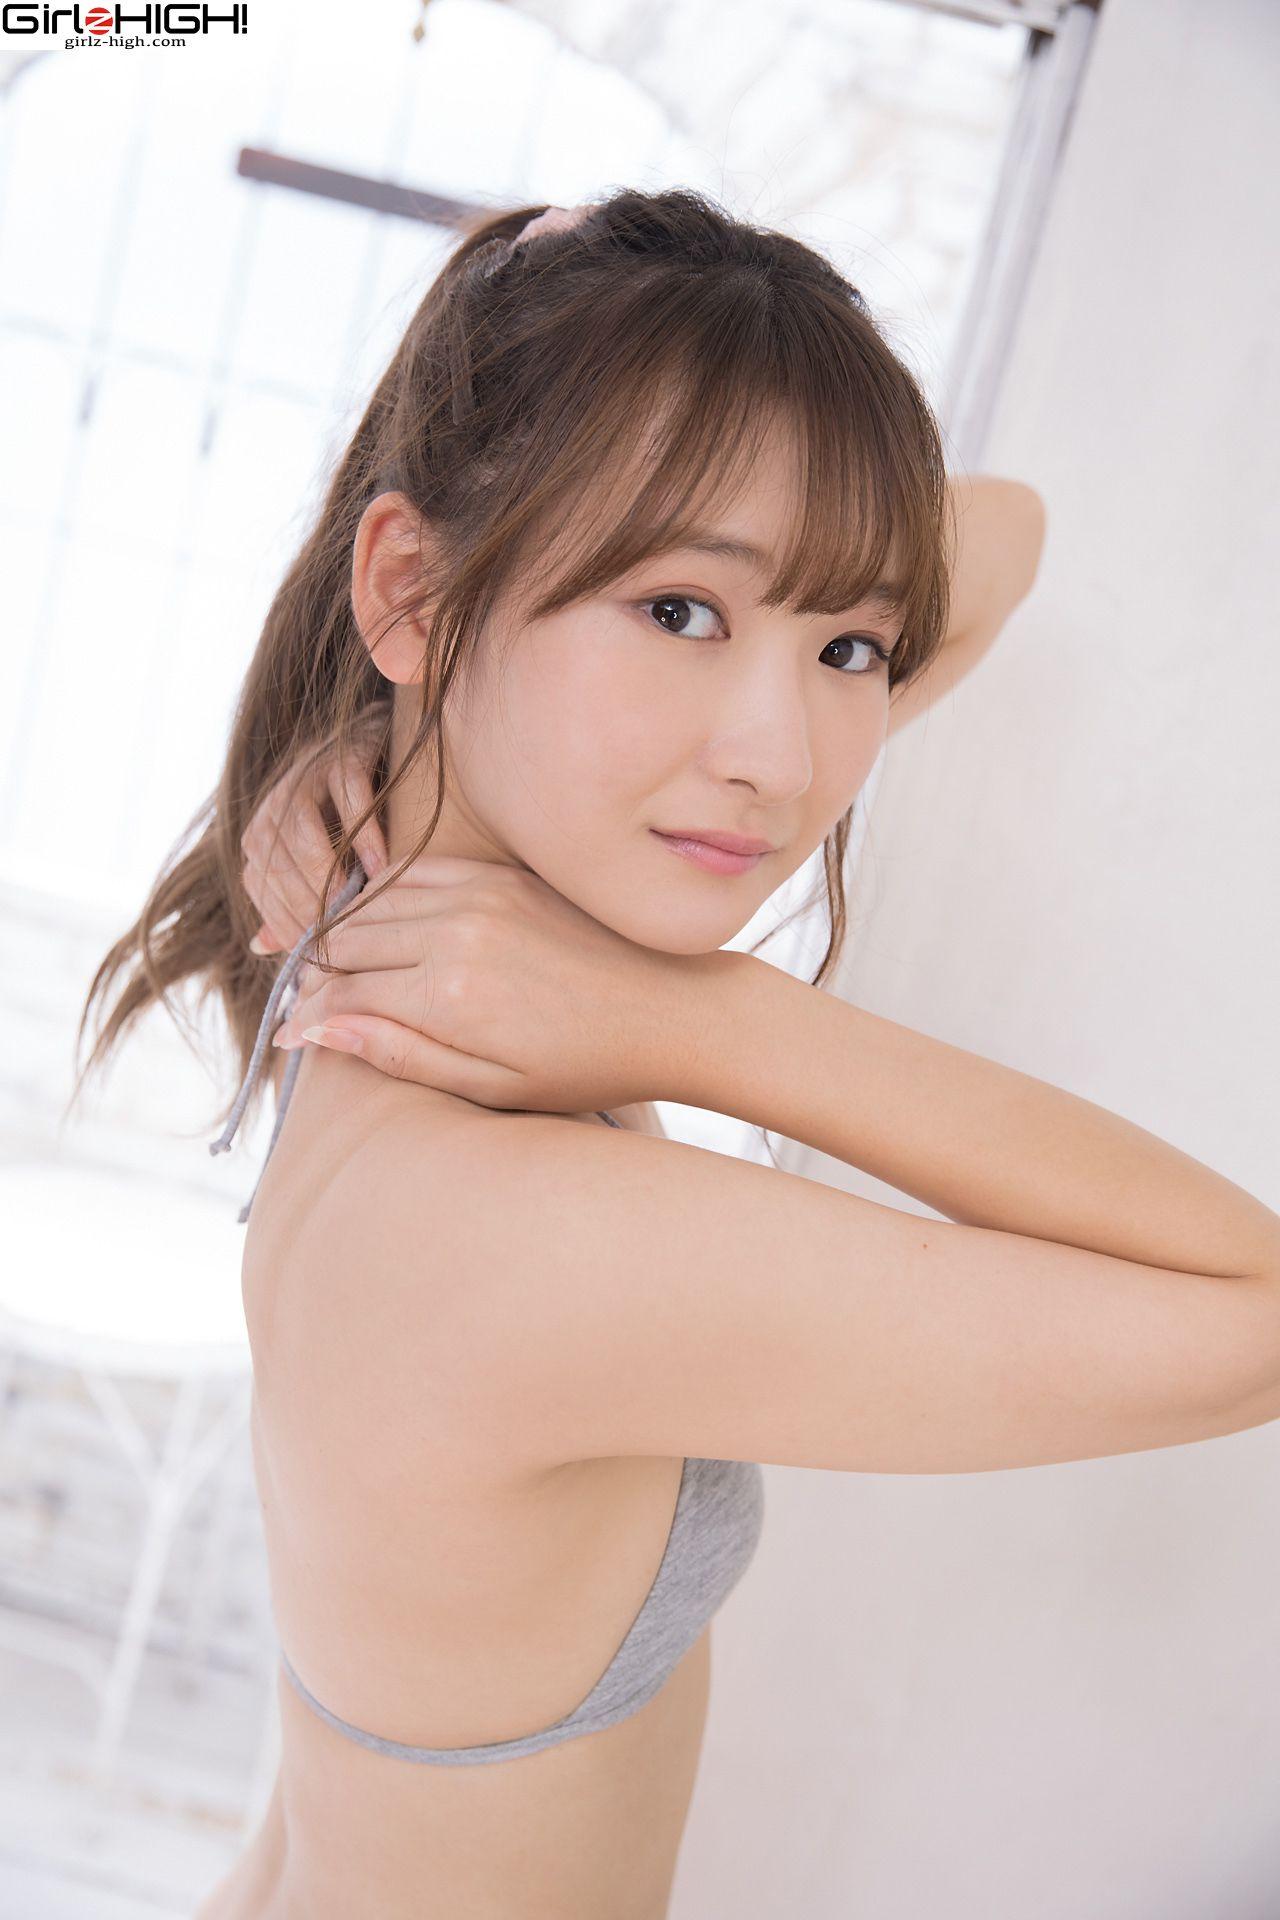 VOL.781 [Girlz-High]内衣美女:近藤麻美(近藤あさみ)超高清写真套图(43P)